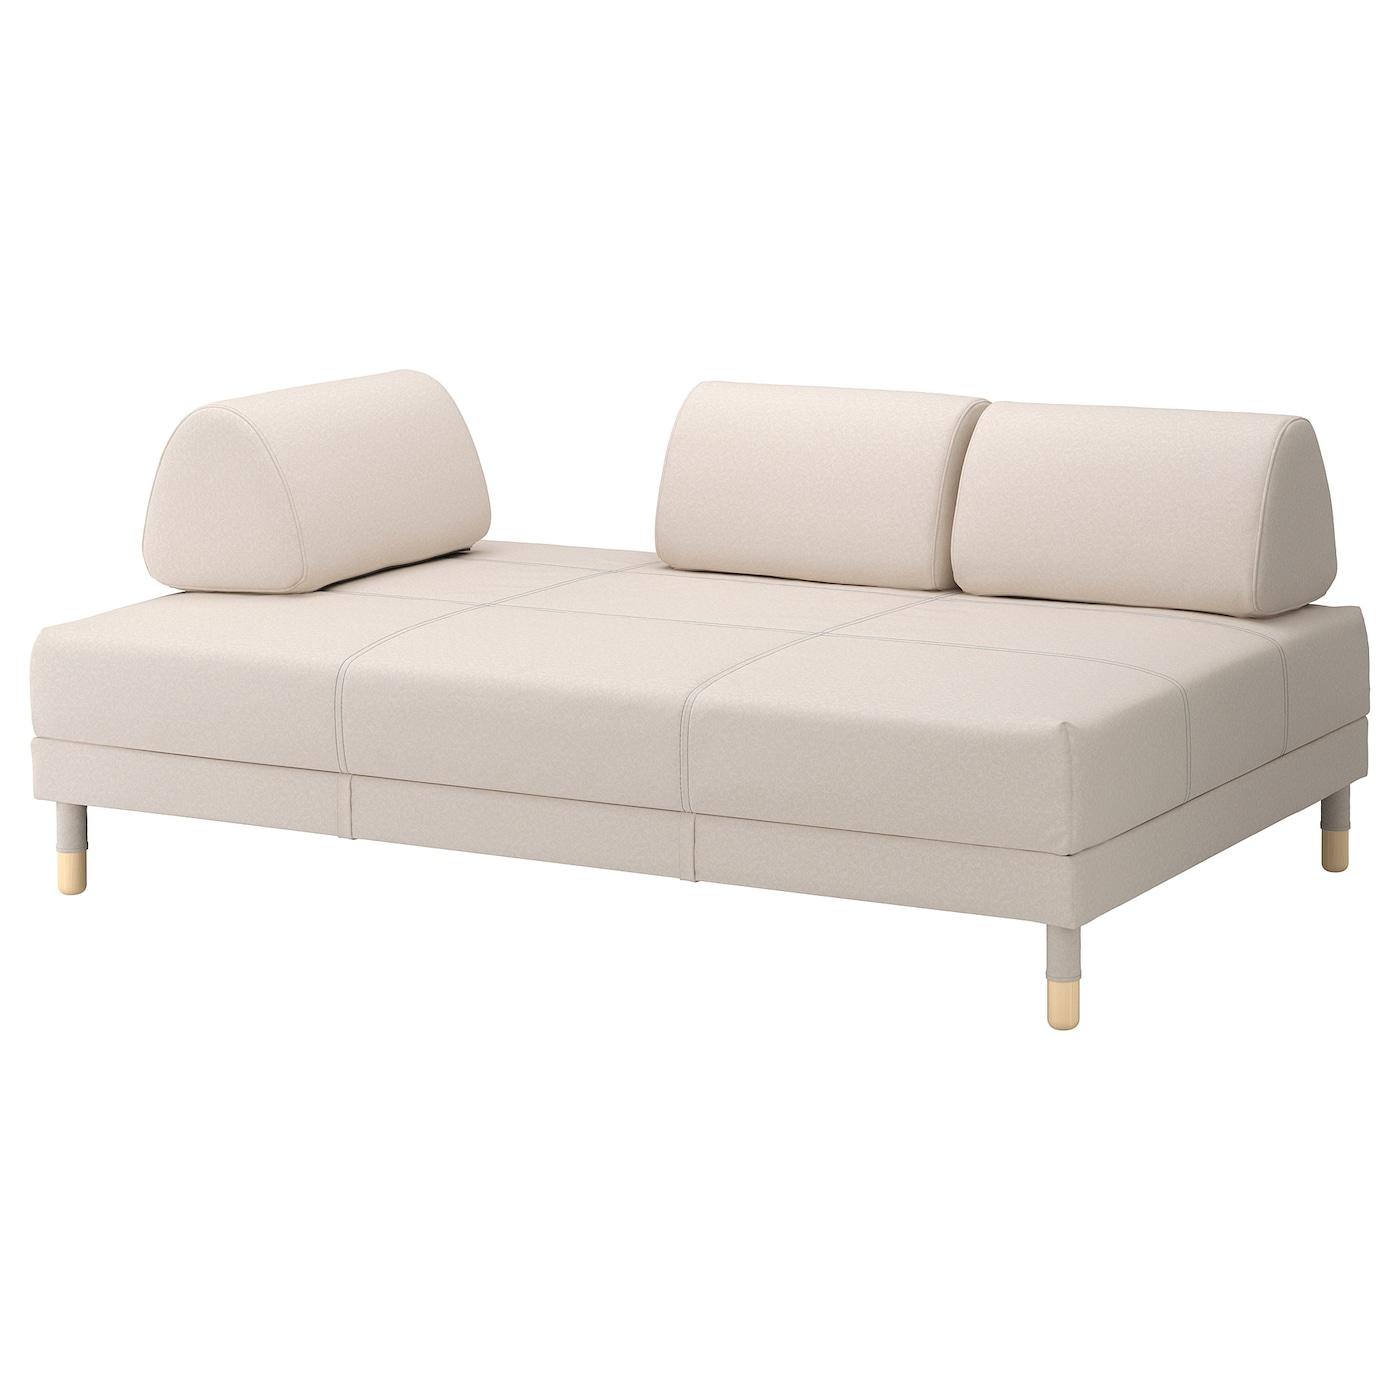 flottebo canap lit 3 places lofallet beige 120 cm ikea. Black Bedroom Furniture Sets. Home Design Ideas